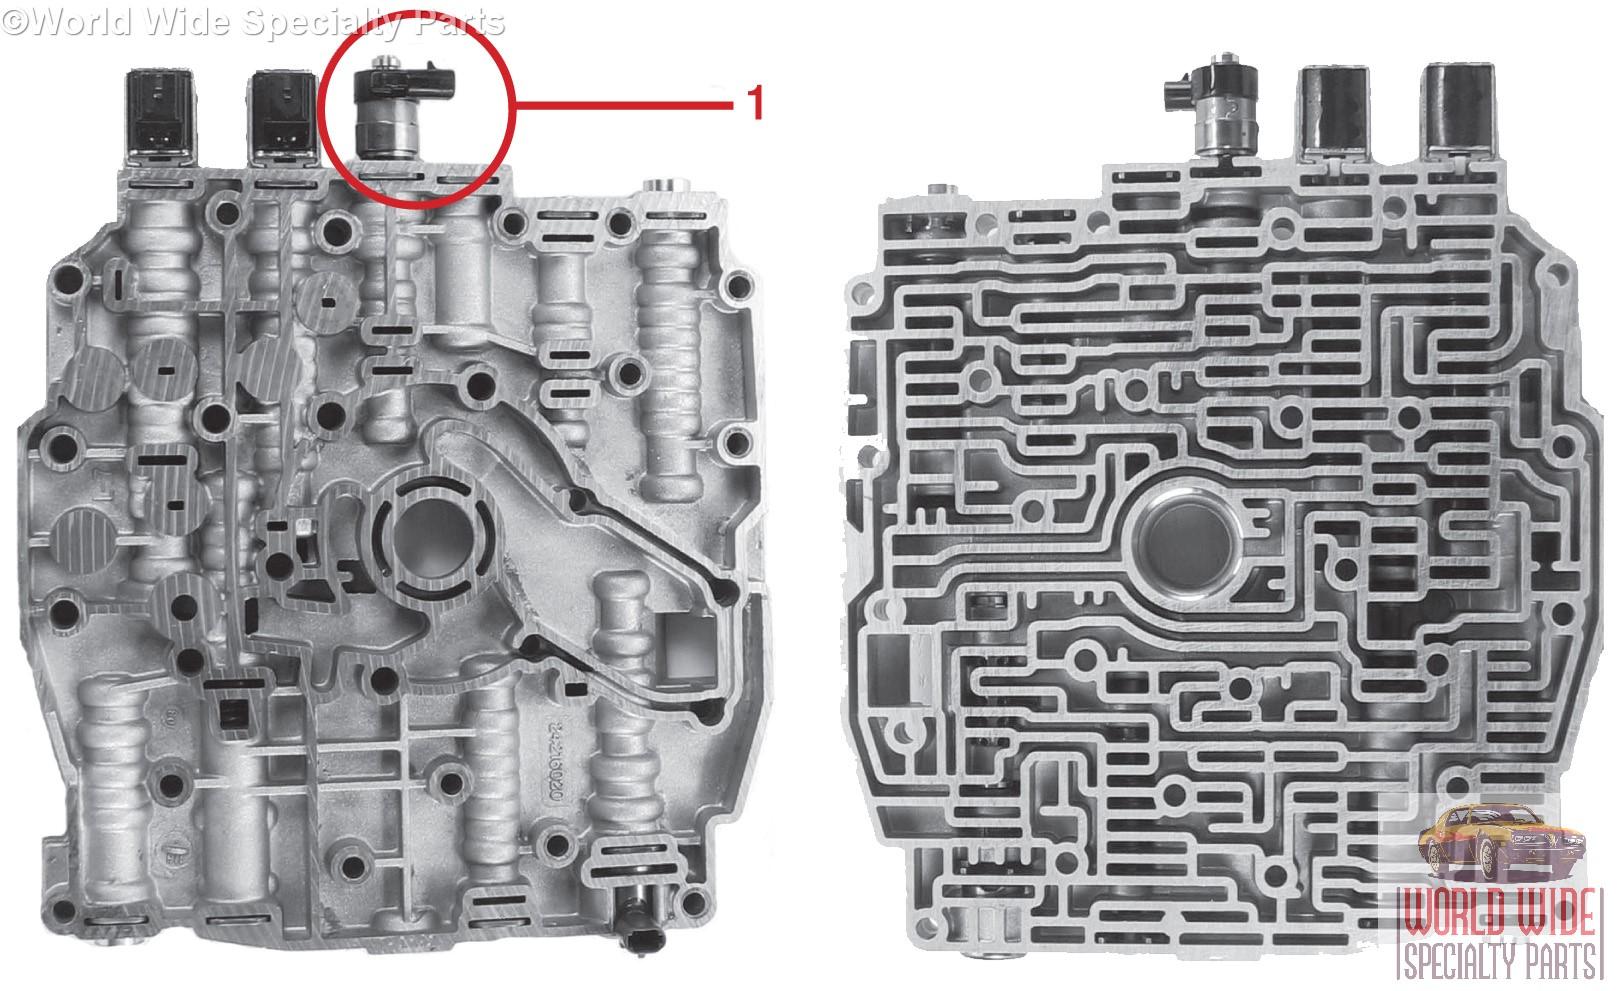 Transmission Valve Body Diagram In Addition Saturn Transmission Parts